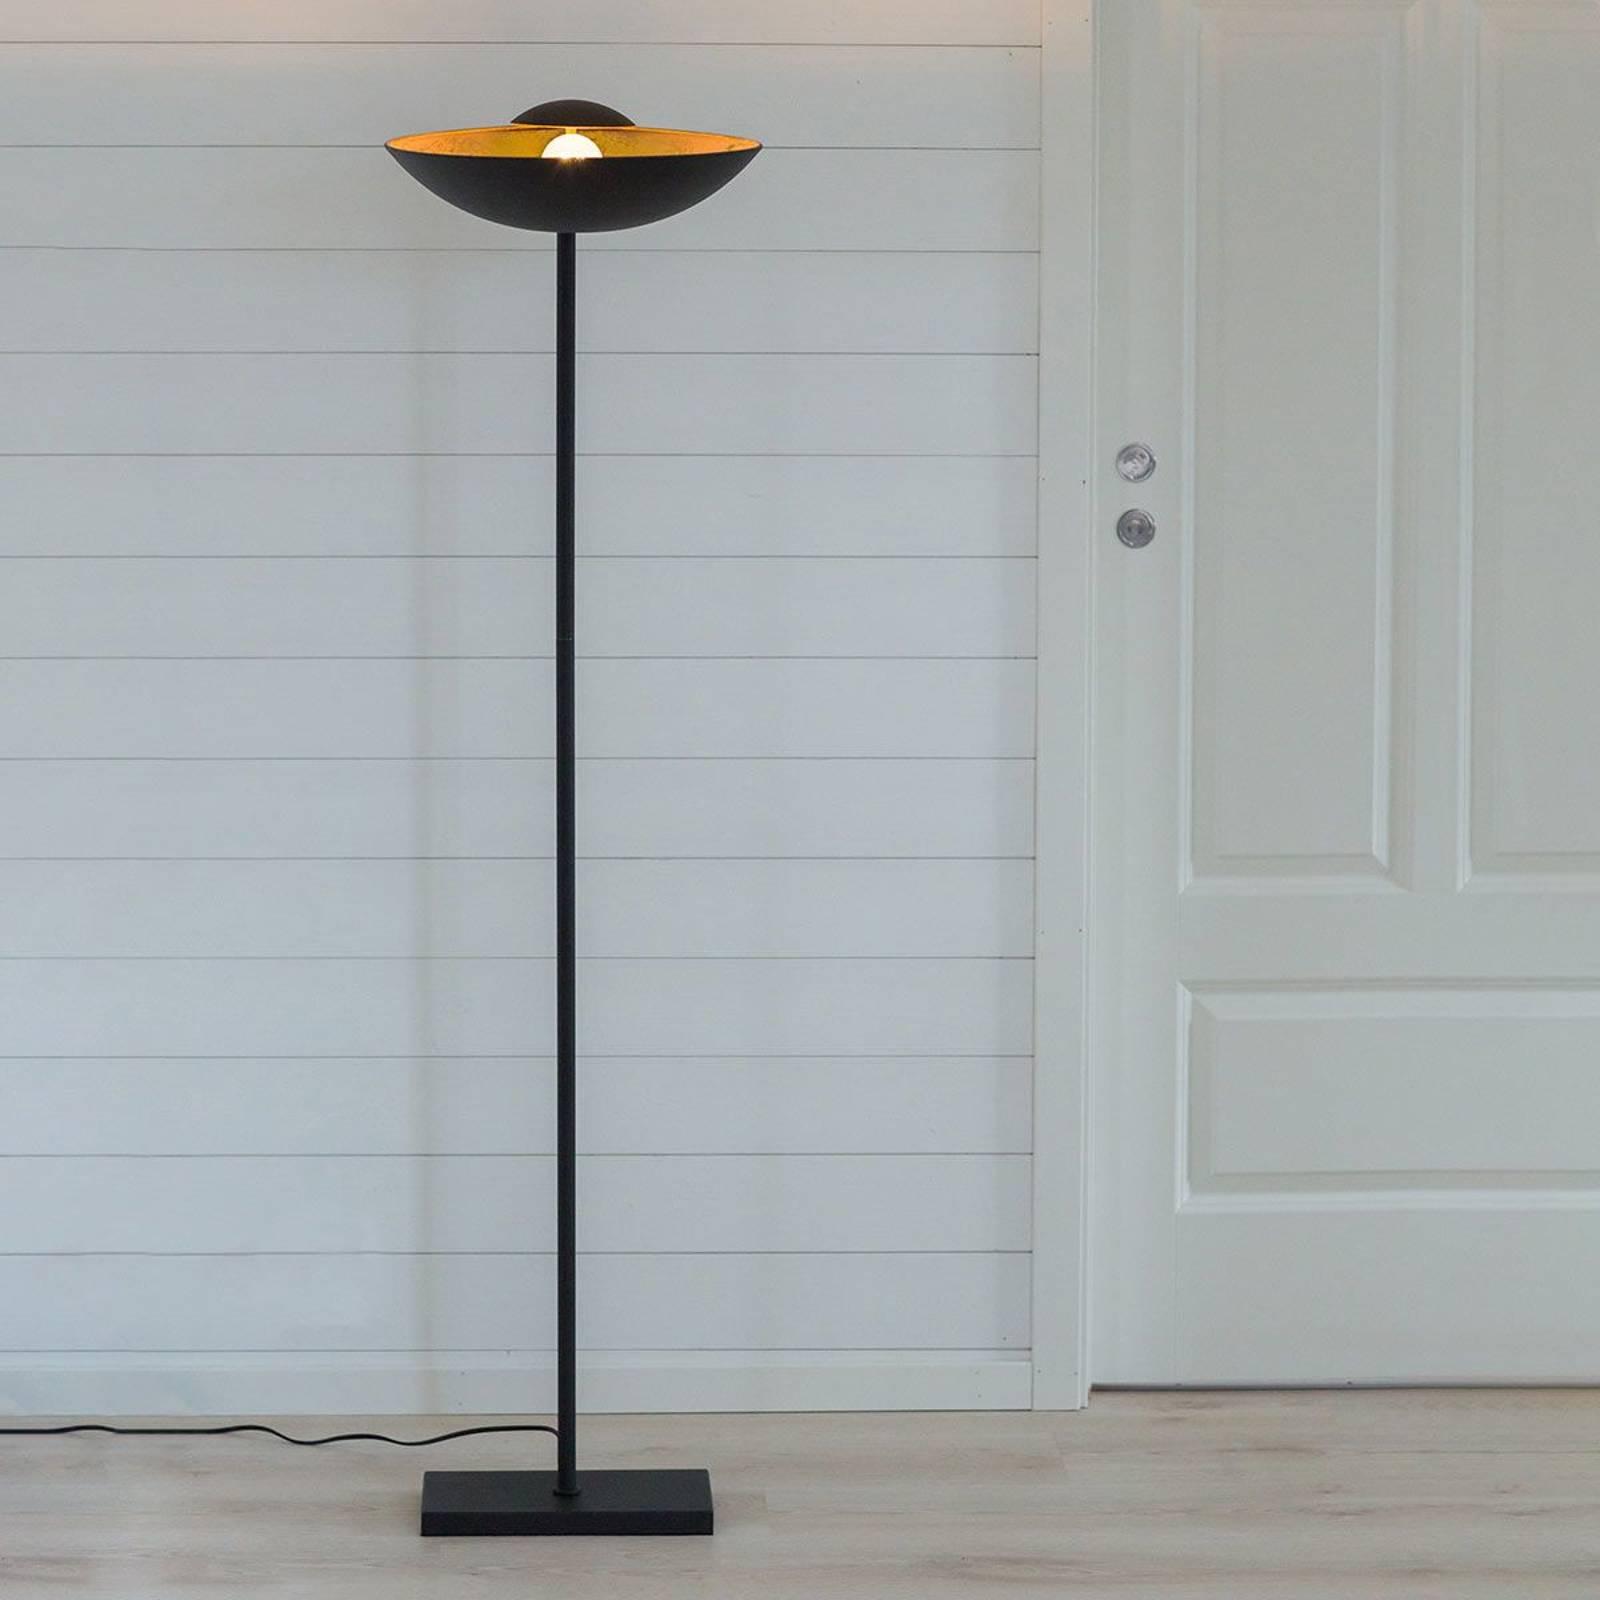 By Rydéns Captain uplight vloerlamp zwart-goud